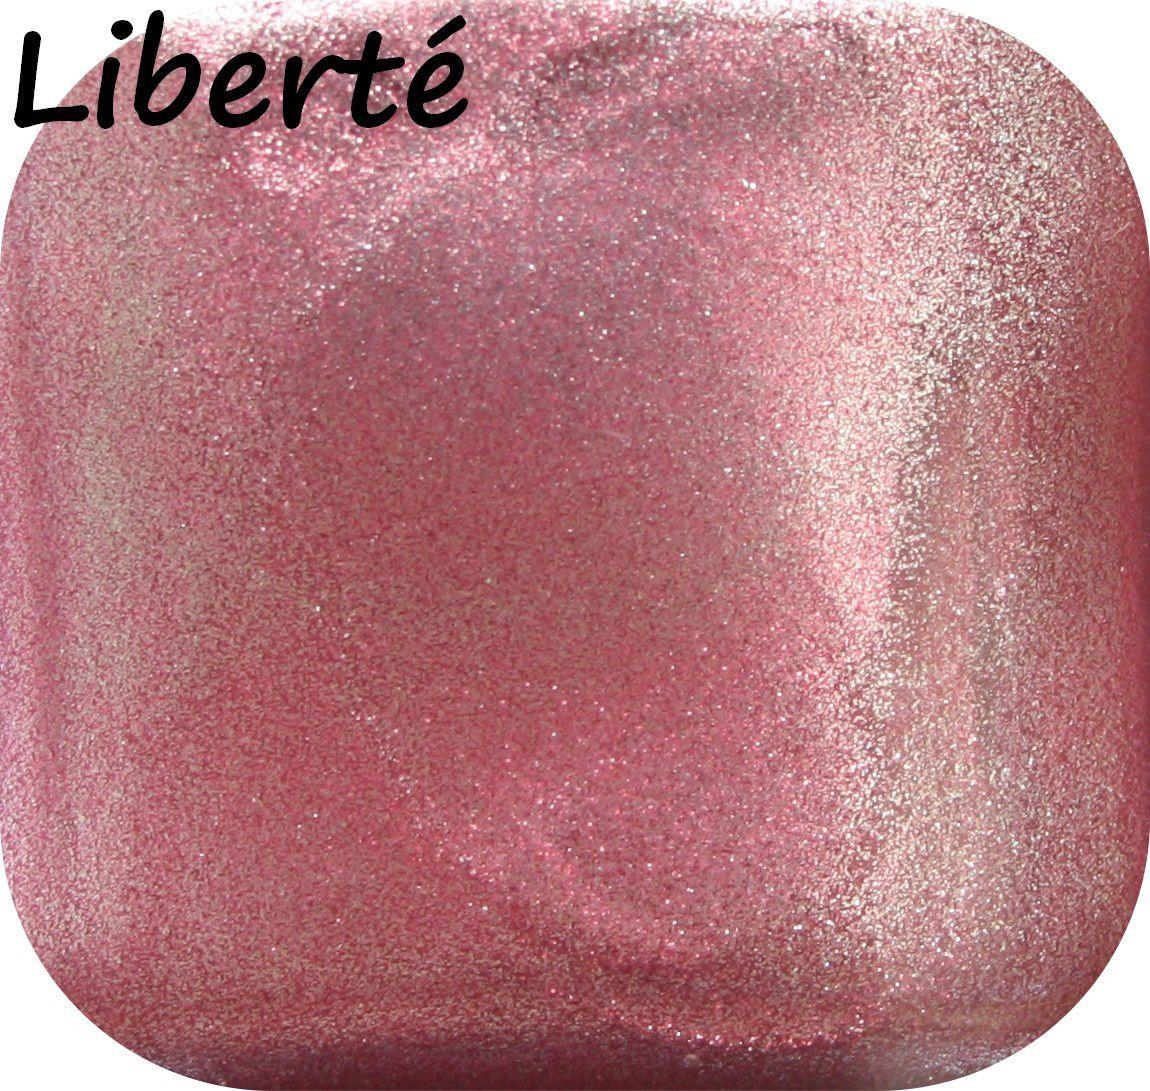 La vie en rose de chez LM Cosmetic